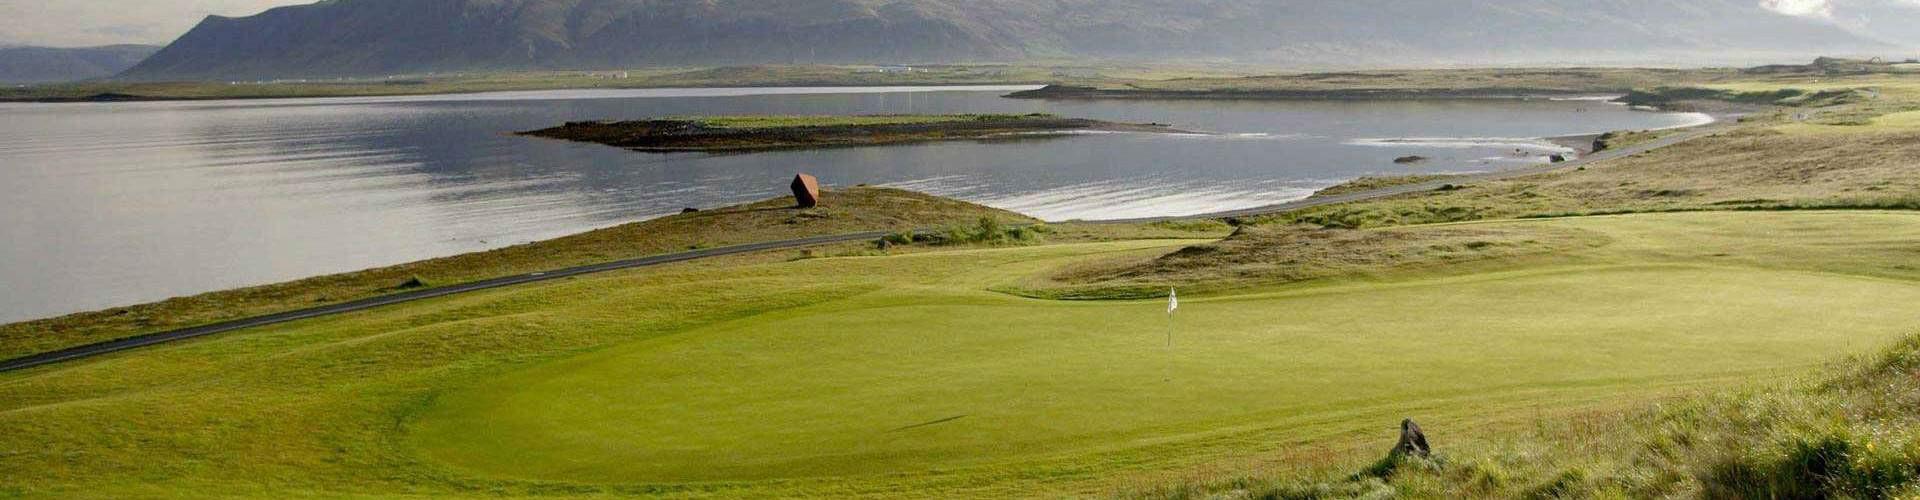 Golfresor Island - golfreseguiden.se